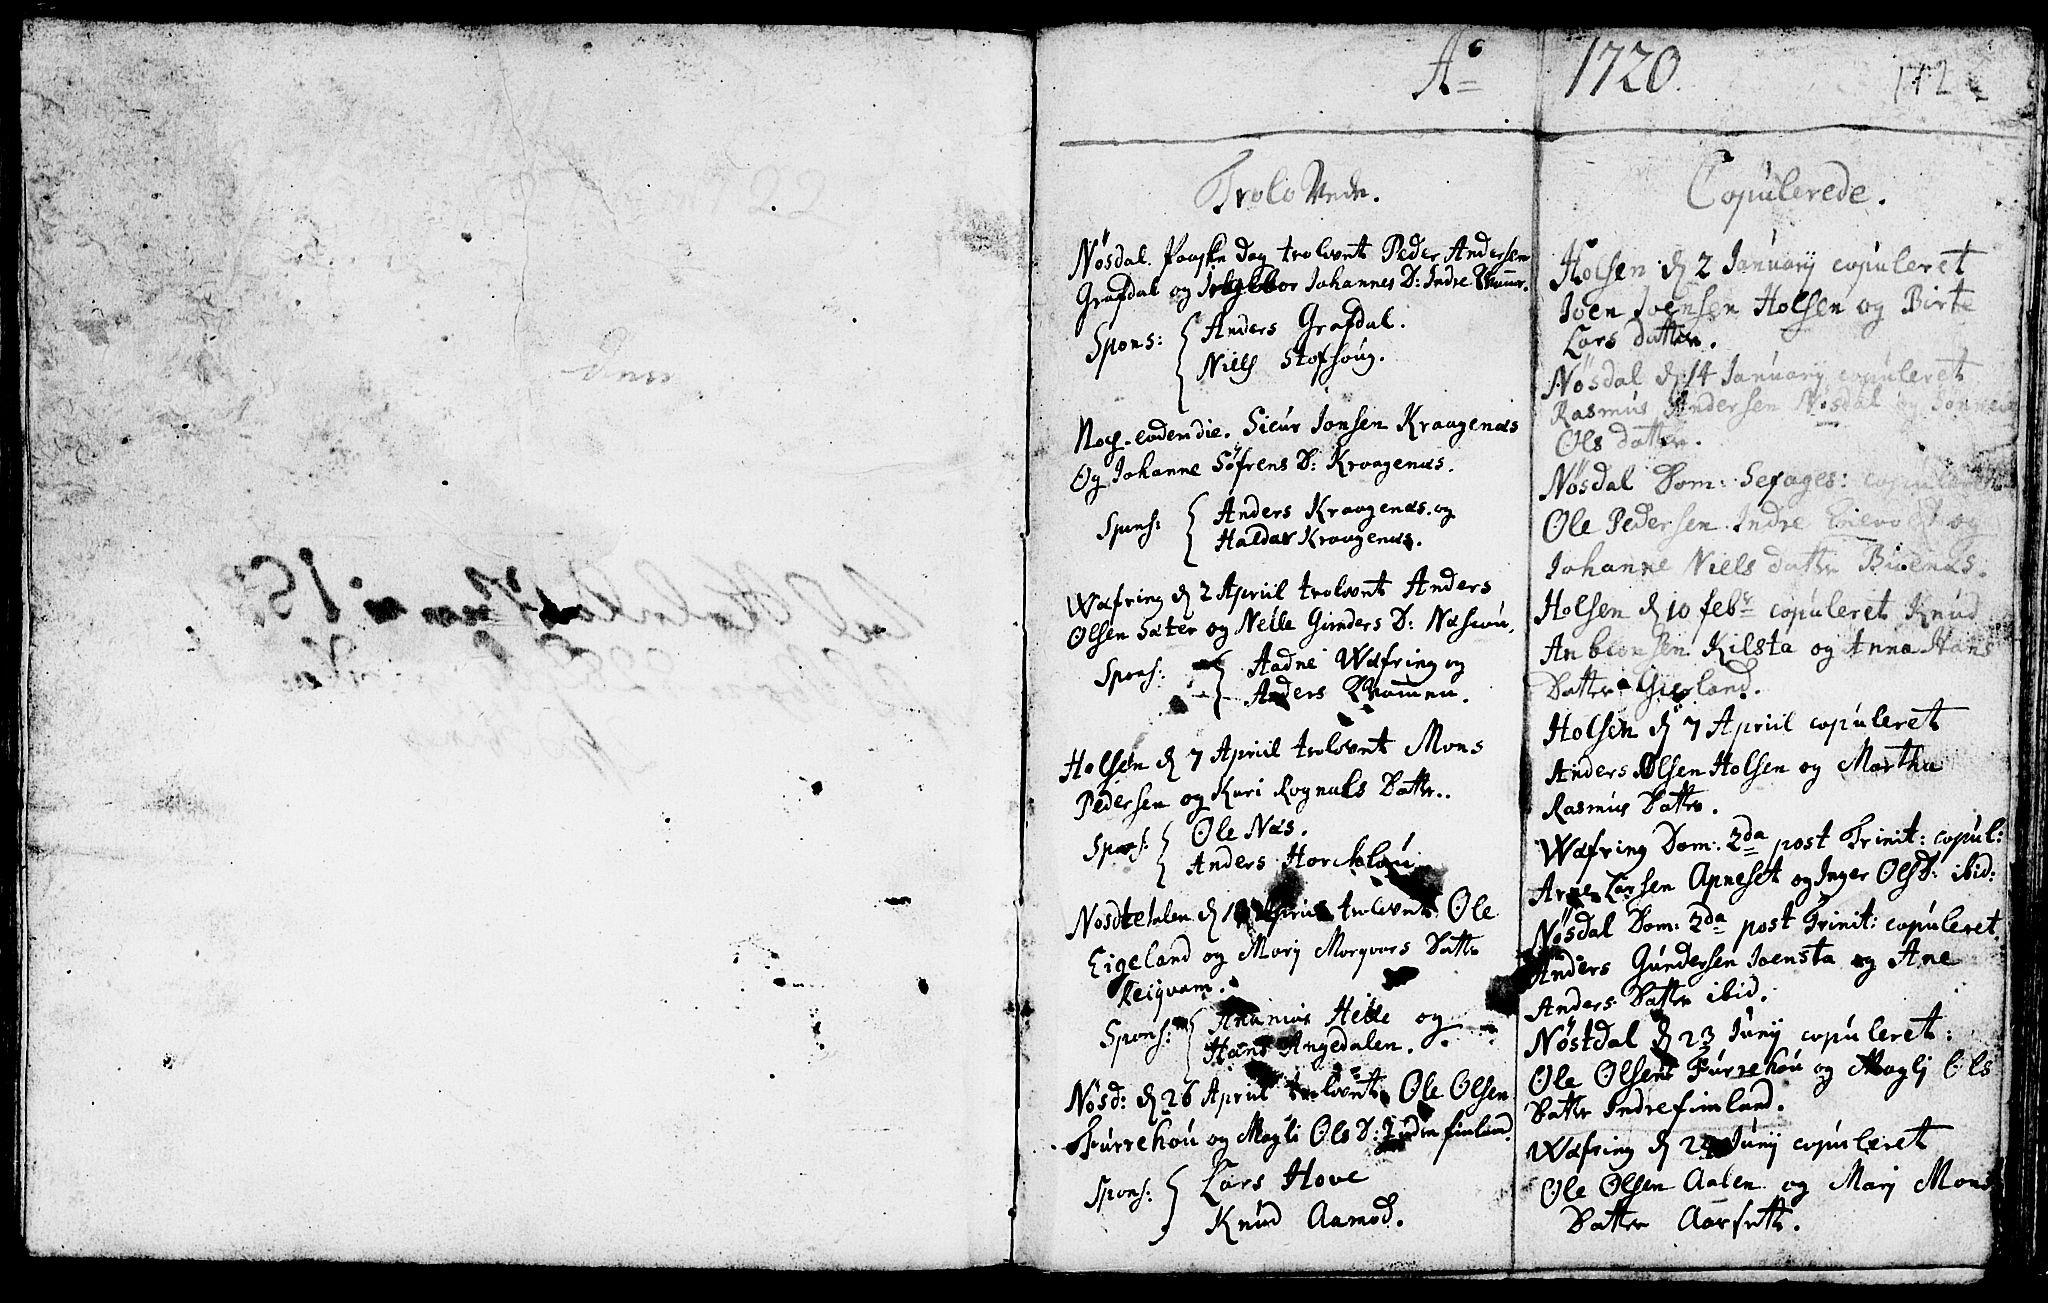 SAB, Førde Sokneprestembete, H/Haa: Ministerialbok nr. A 1, 1720-1727, s. 112